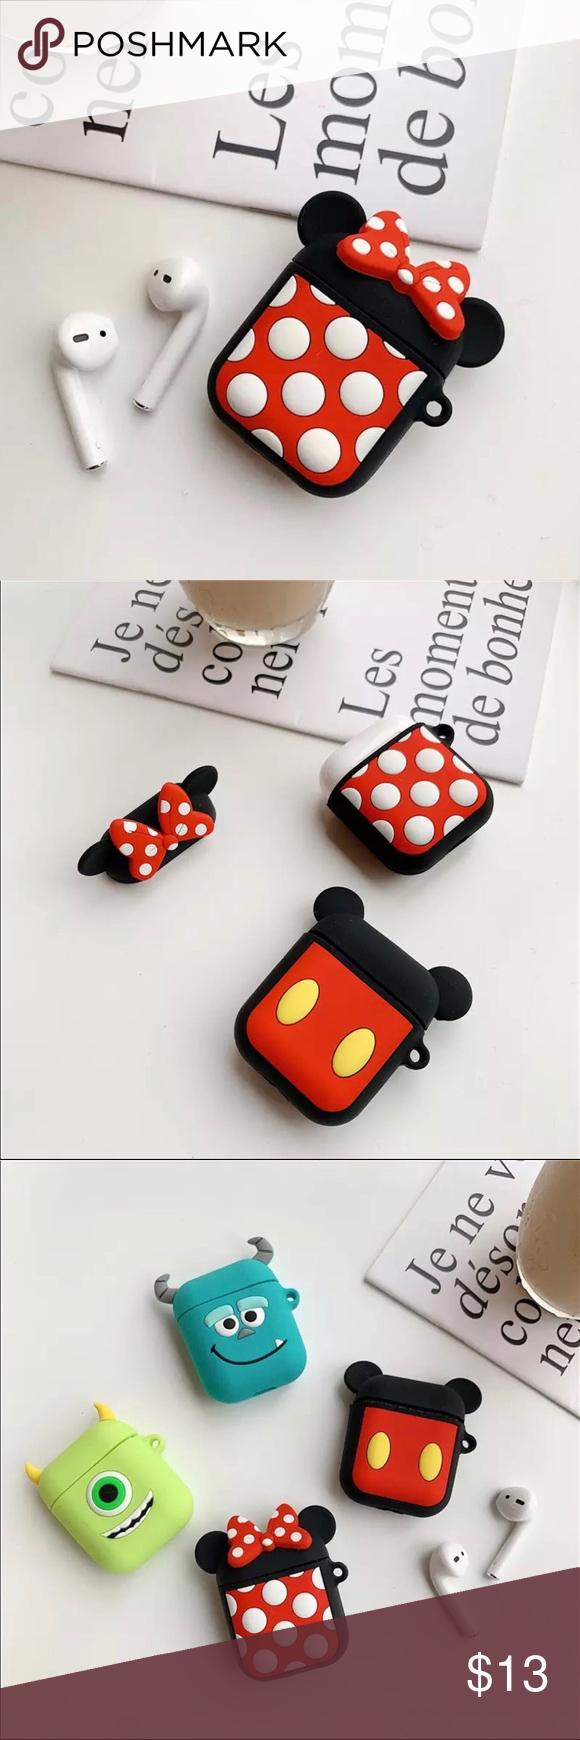 3/30 ️ Disney's Minnie Mouse AirPods Case Airpod case